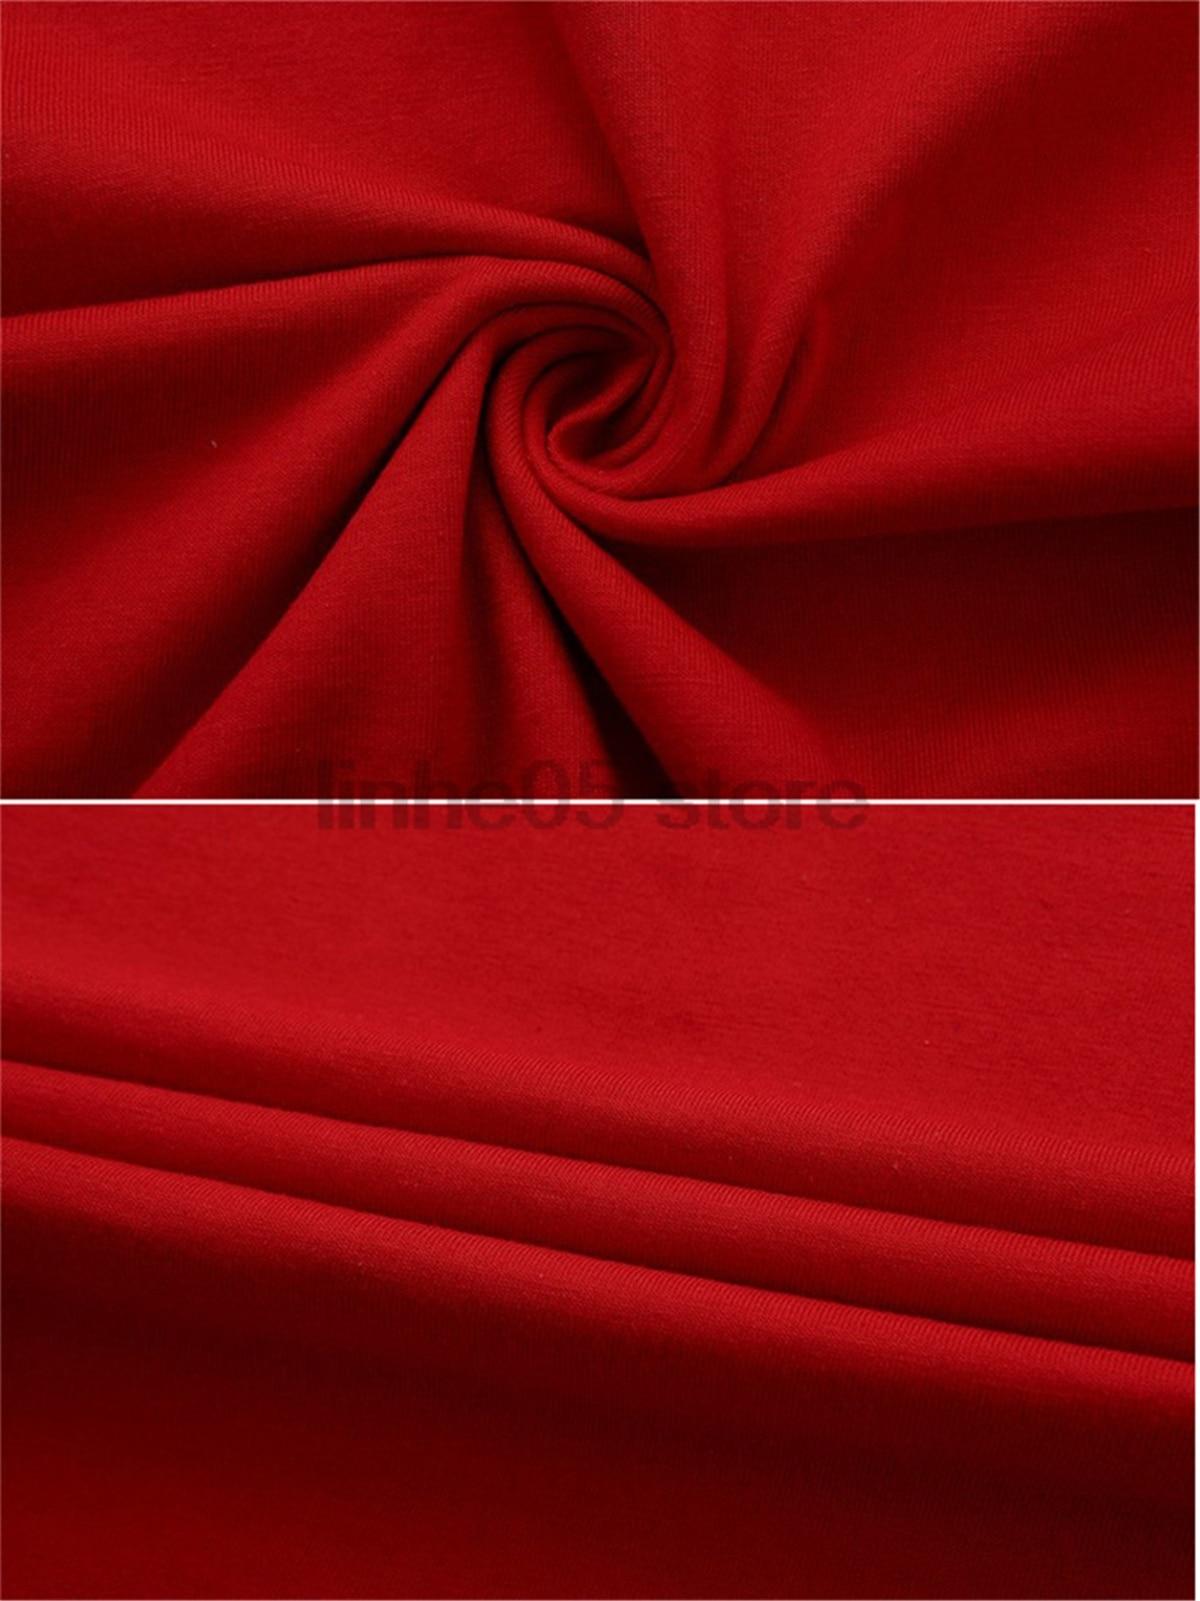 GILDAN Womens I Love Roller Derby T-shirt ~ Red Bloody Girl Lips Dress female T-shirt